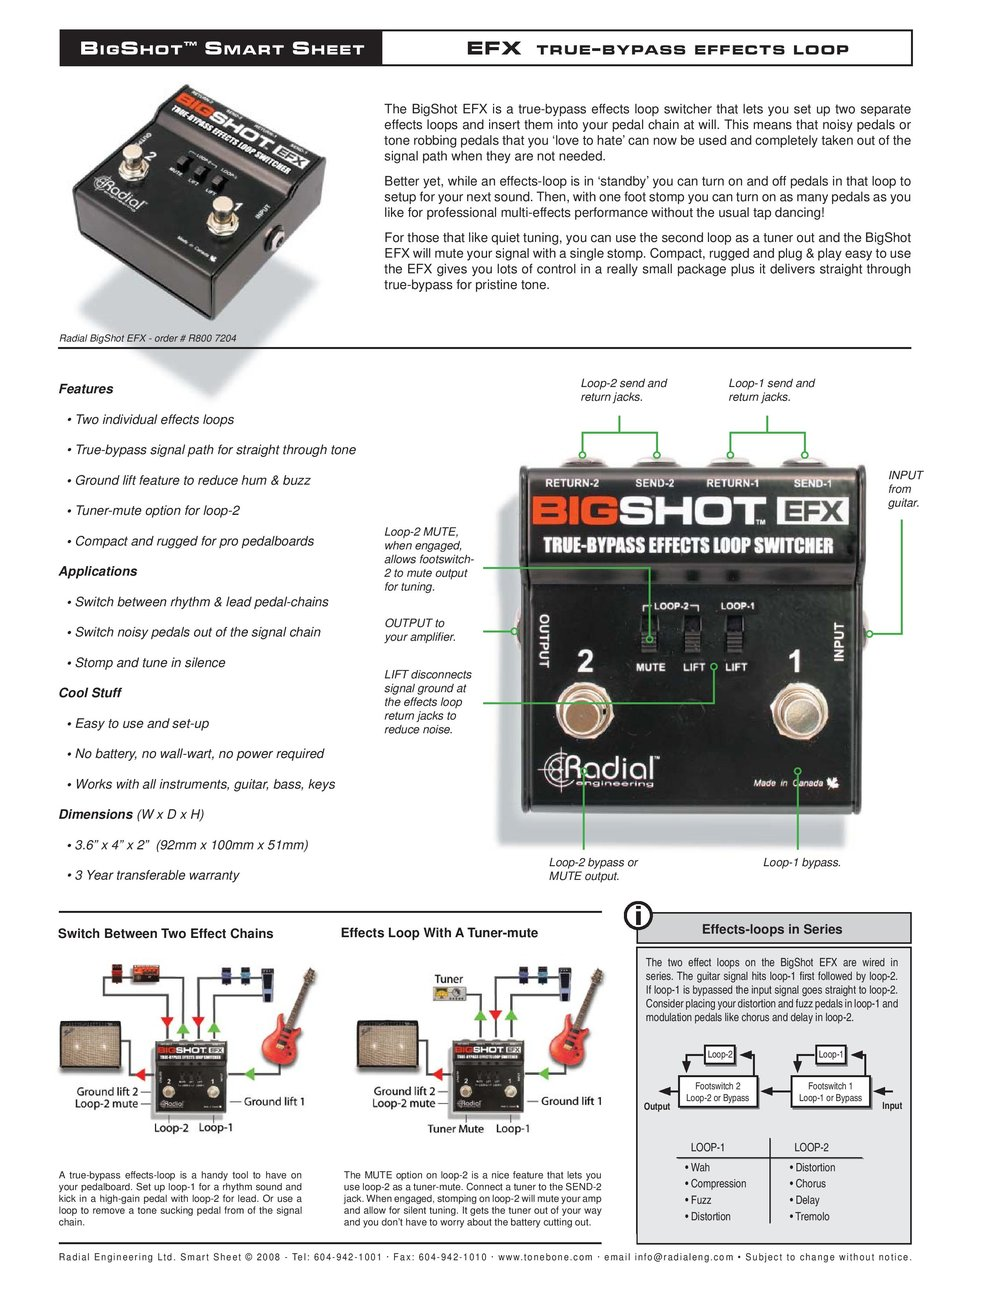 smartsheet-bigshot-efx-page-001.jpg